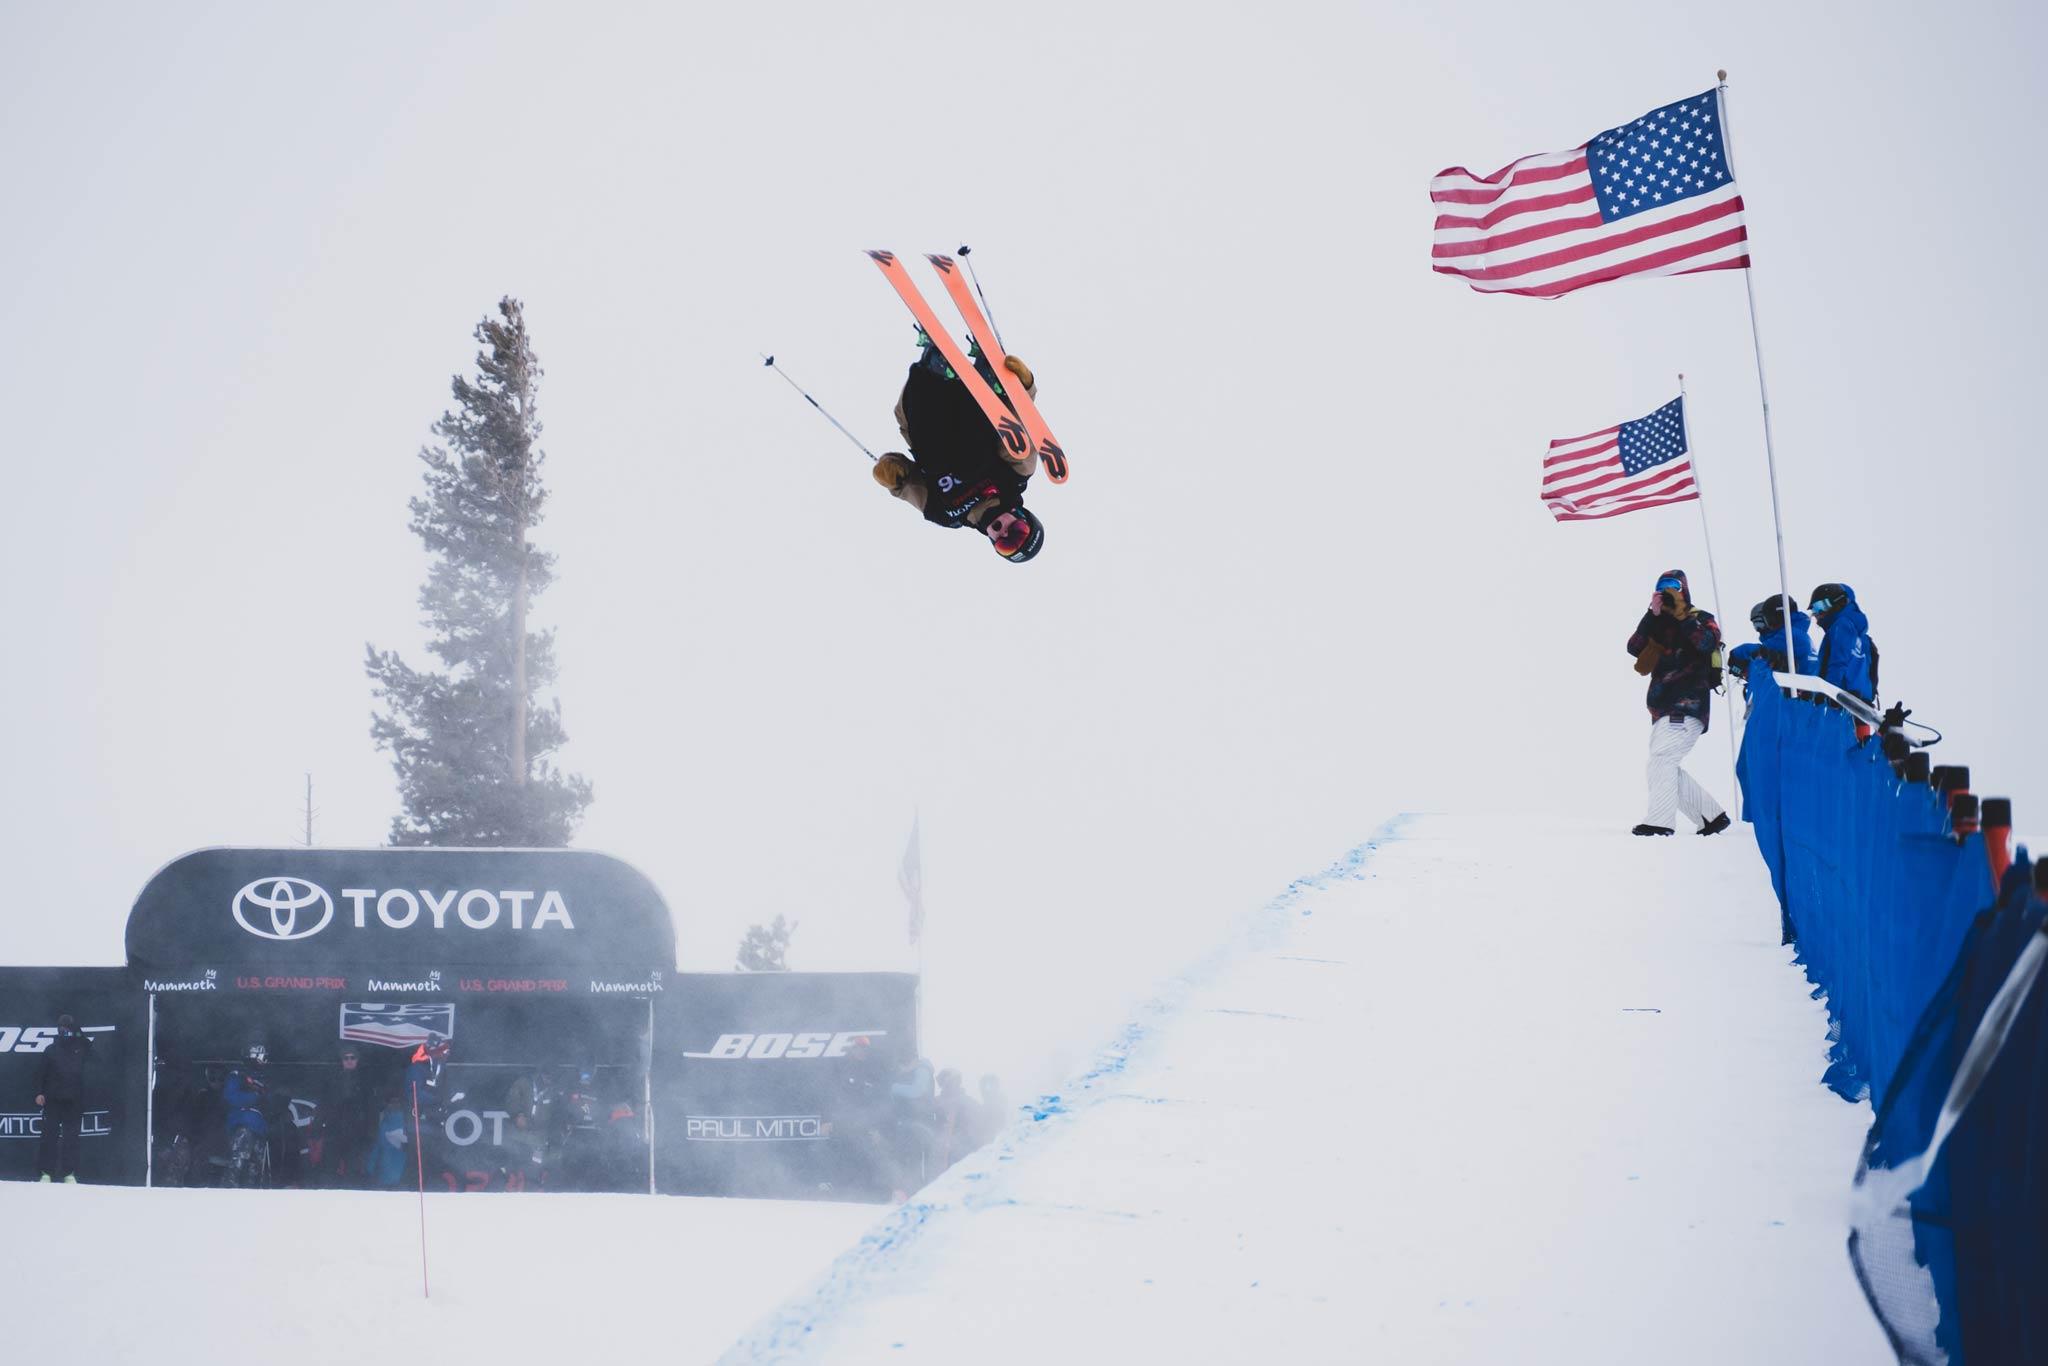 FIS Freestyle Halfpipe World Cup 18/19 #4: Mammoth Mountain (USA) – Infos, Ergebnisse & Winning Runs